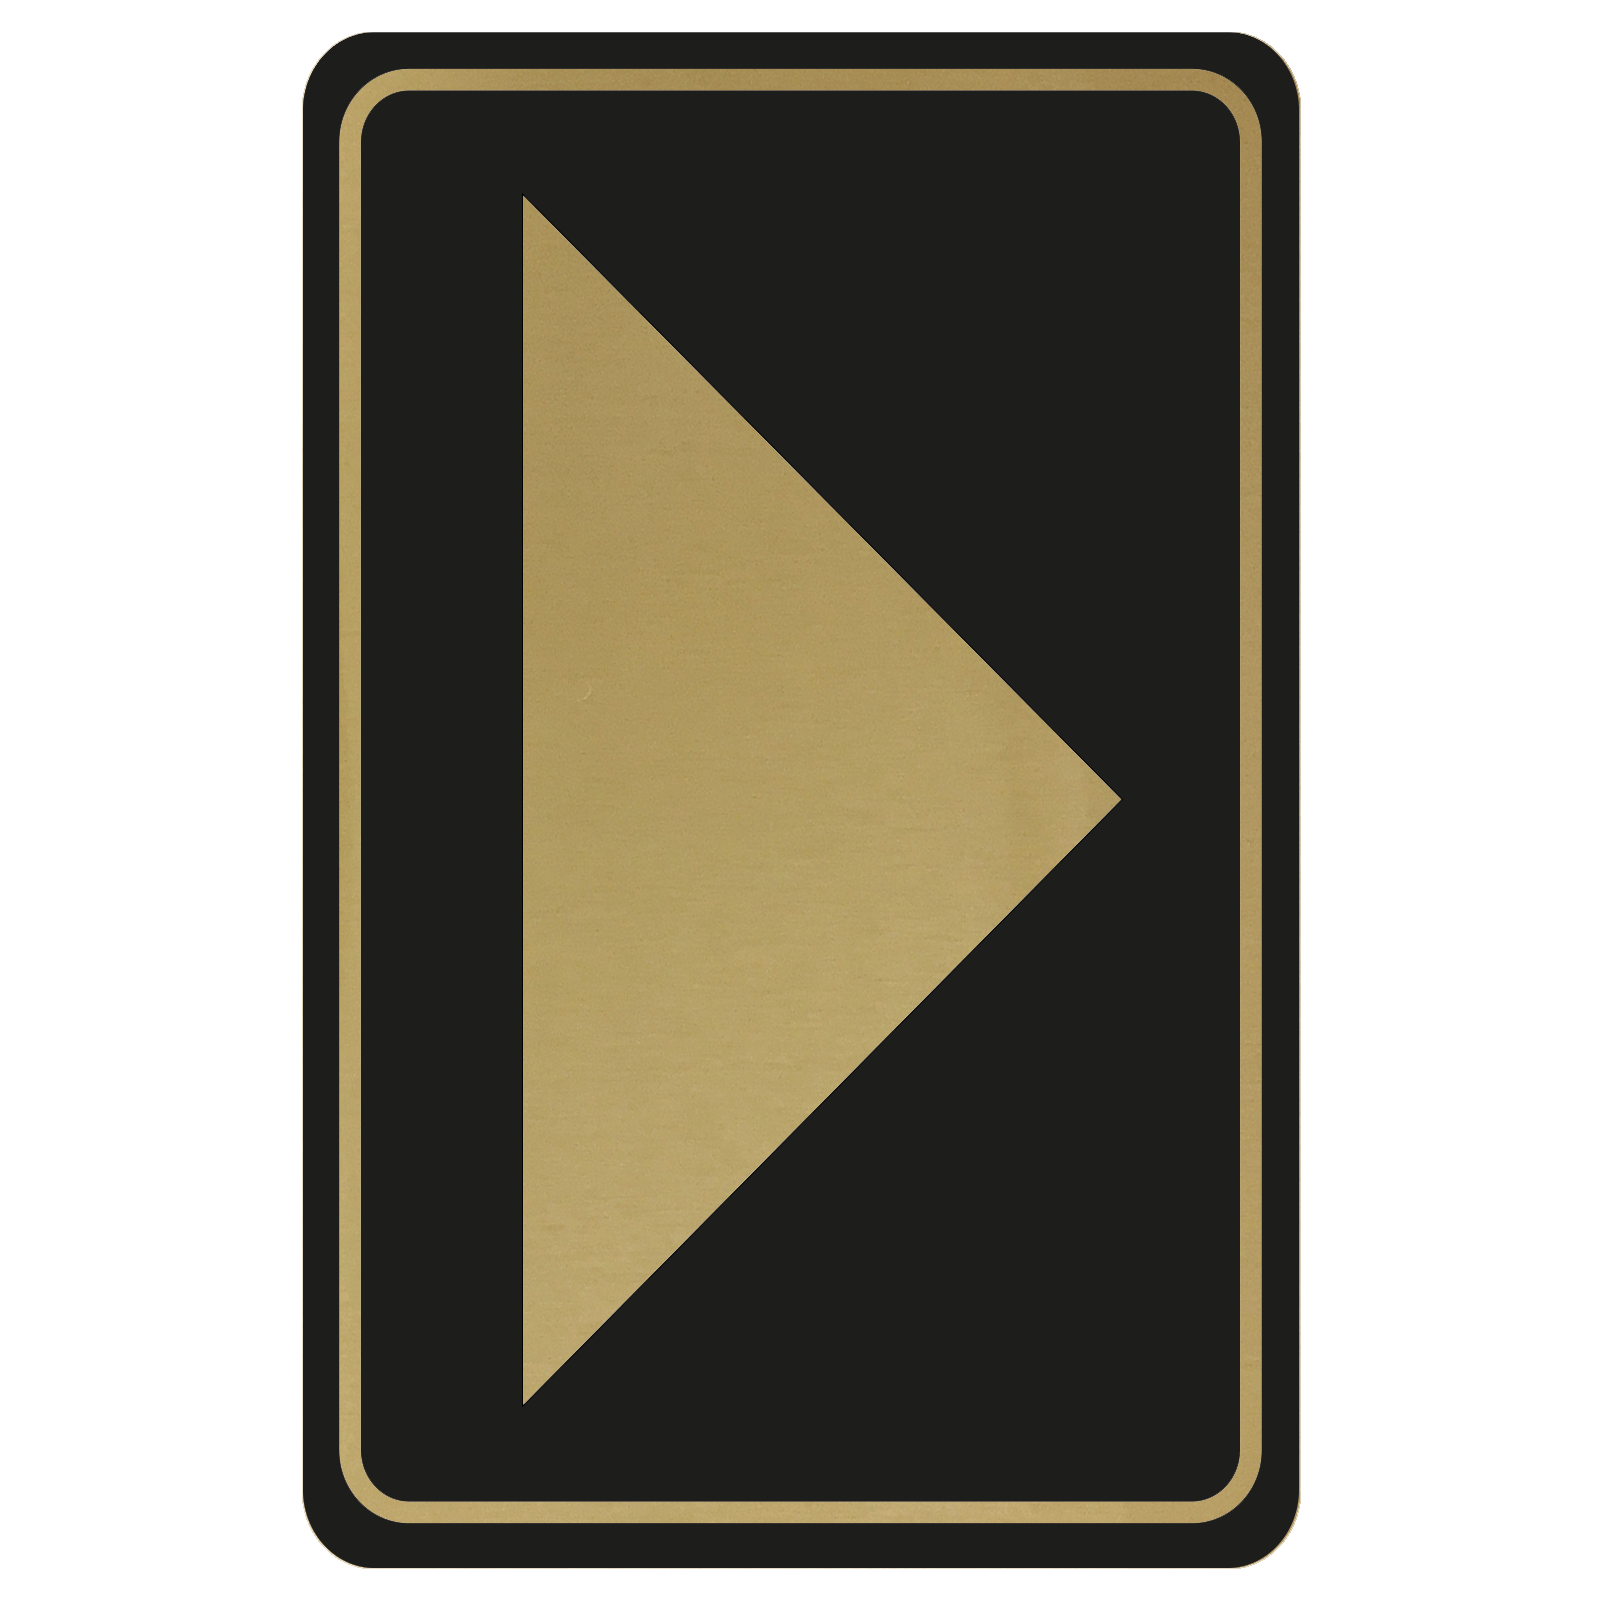 Large Arrow Door Sign - Gold on Black